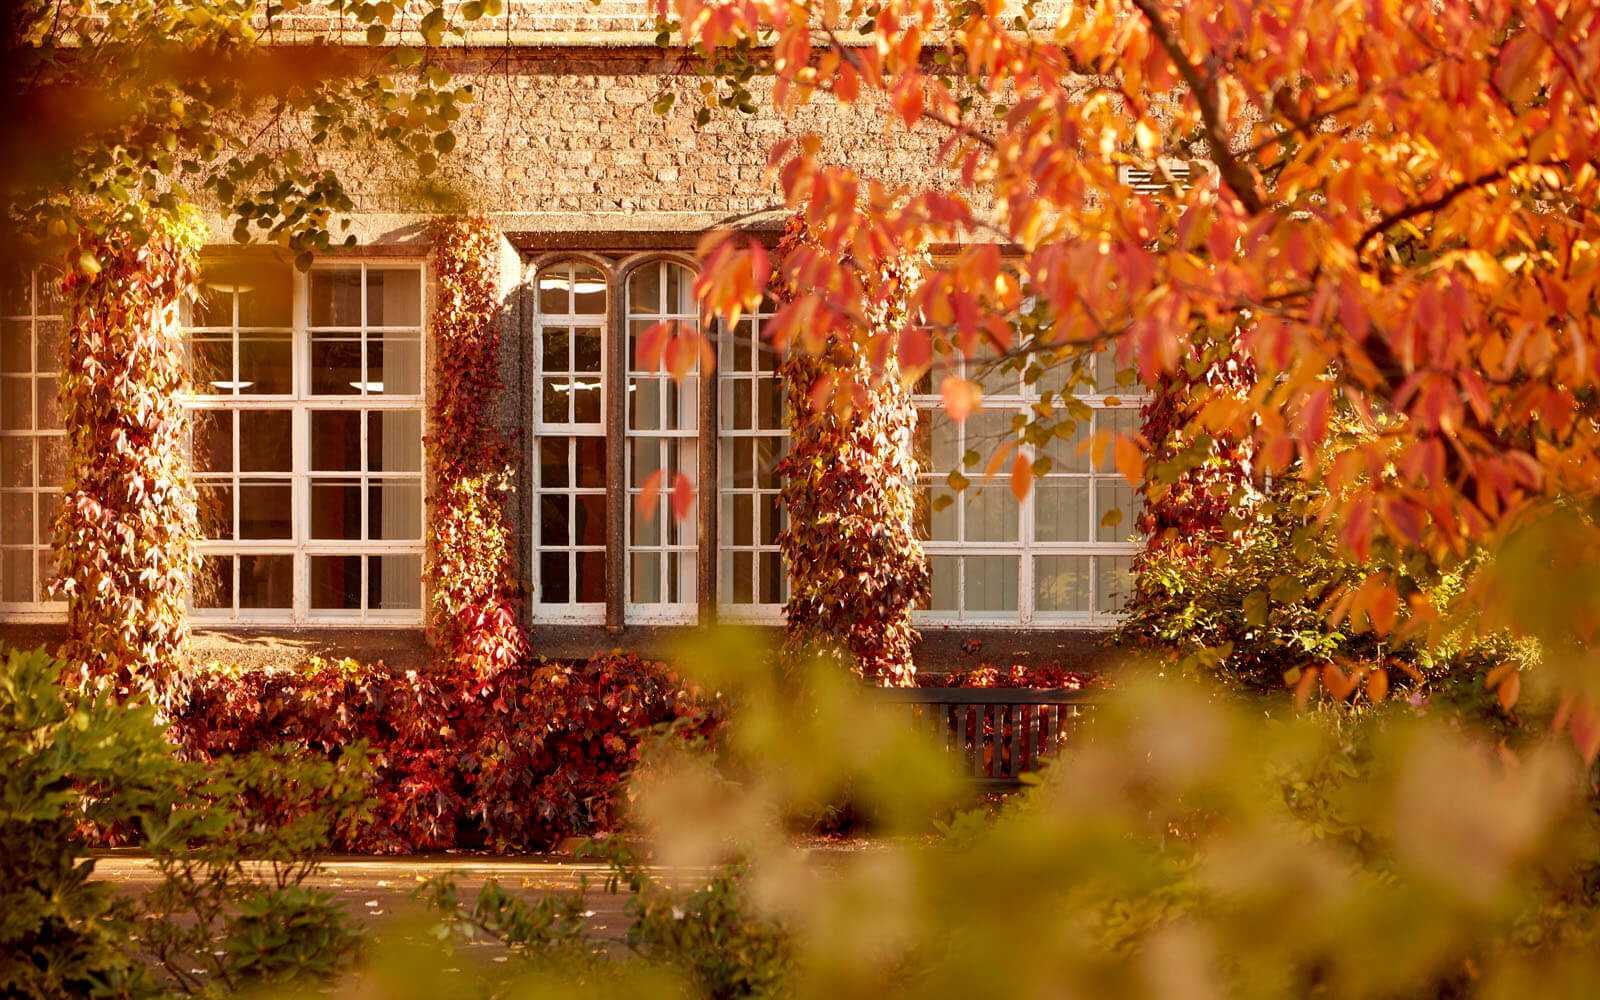 Campus building seen through trees